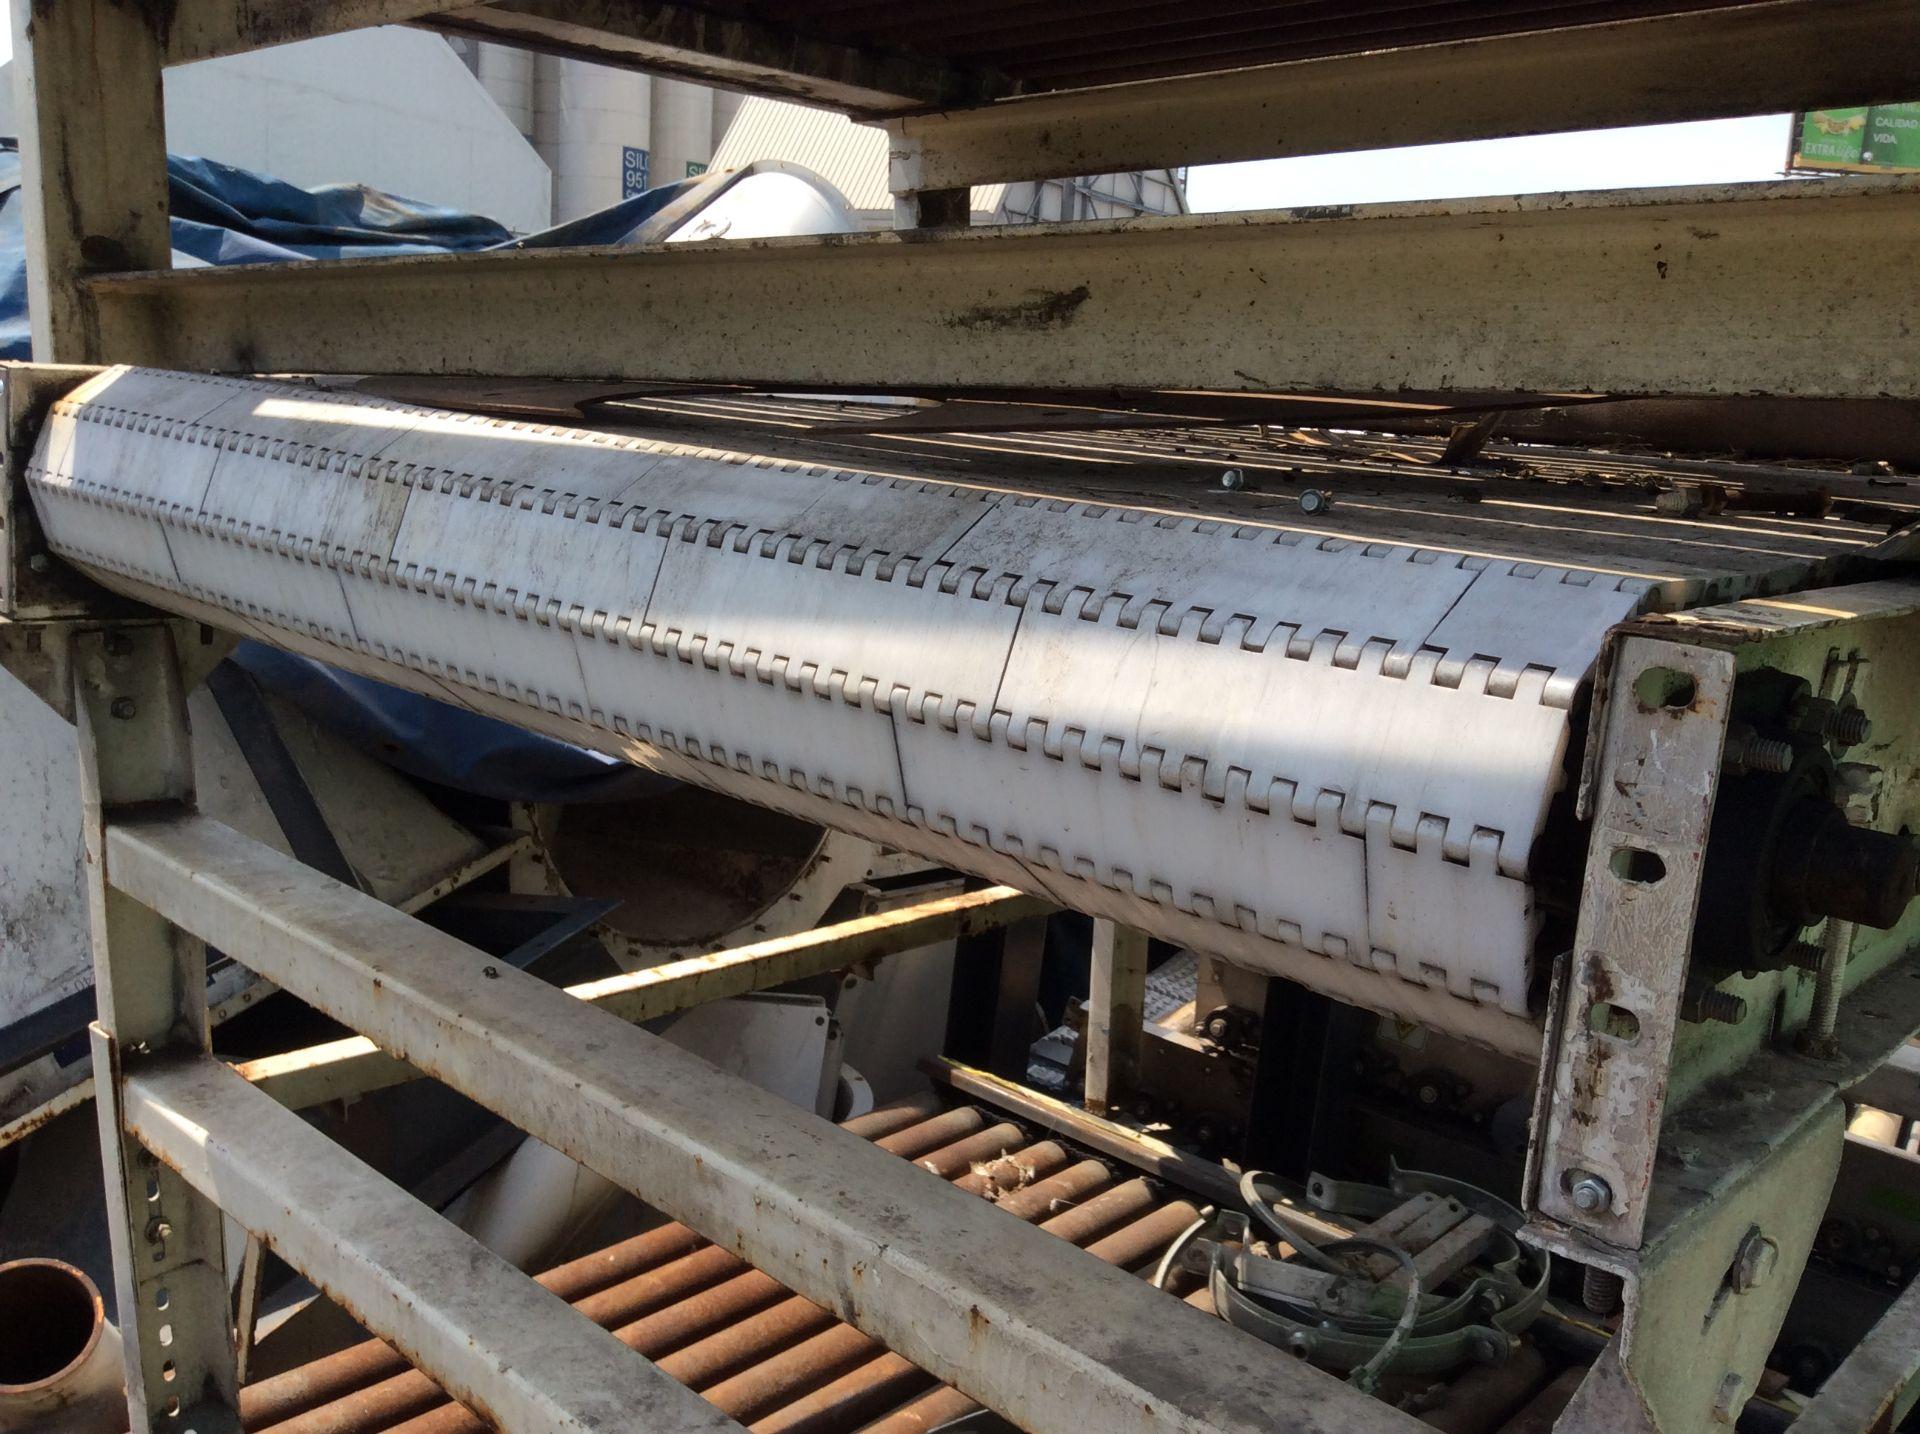 1 Roller conveyor, measures 1.37 x 1.50 x .67, 1 Conveyor measures 1.20 x 2.08x .65 - Image 3 of 8